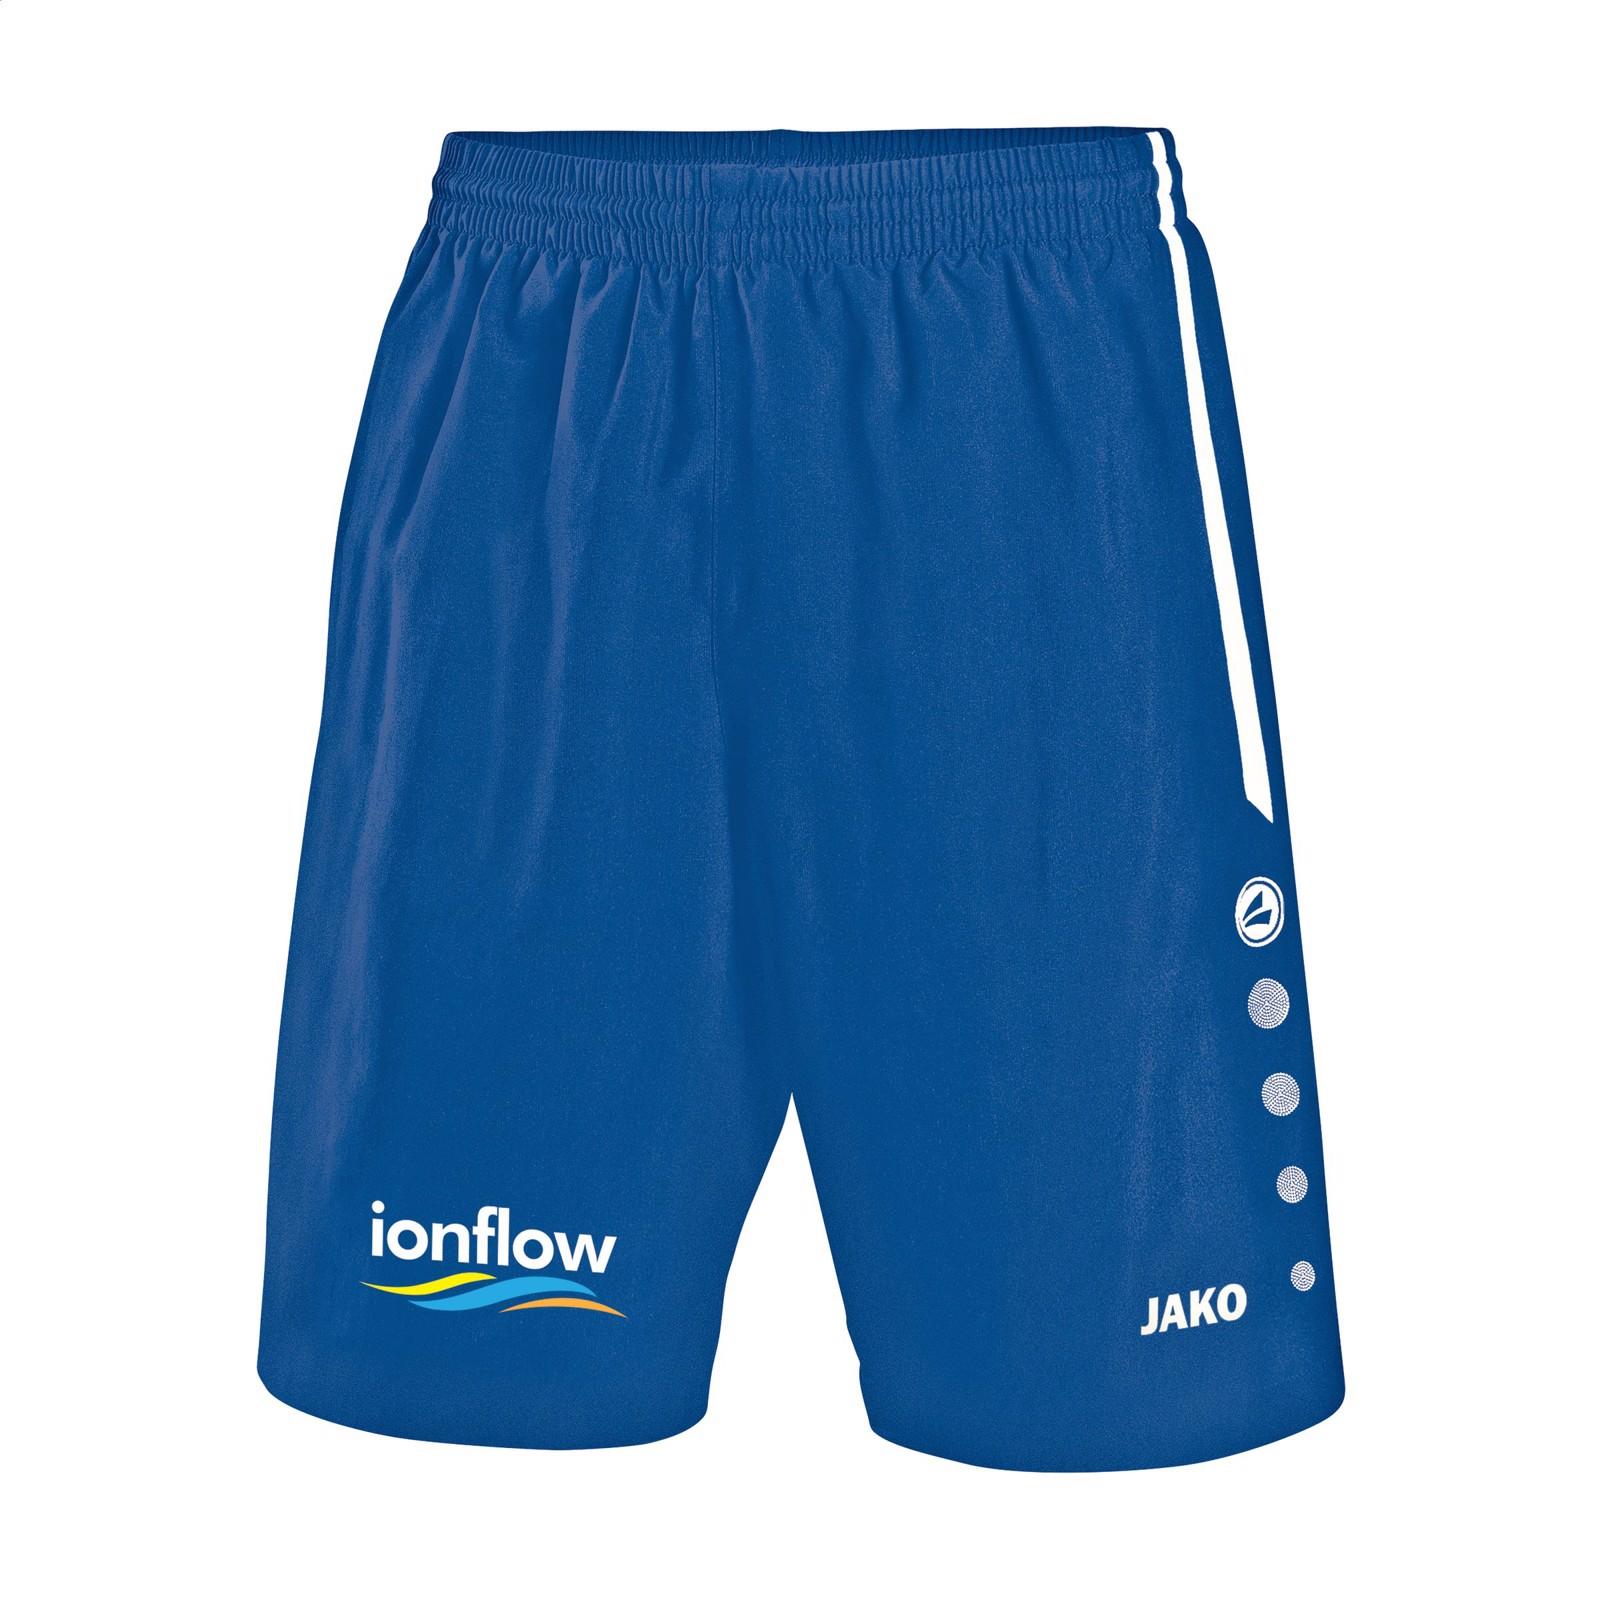 Jako® Shorts Turin mens - Royal Blue / White / L